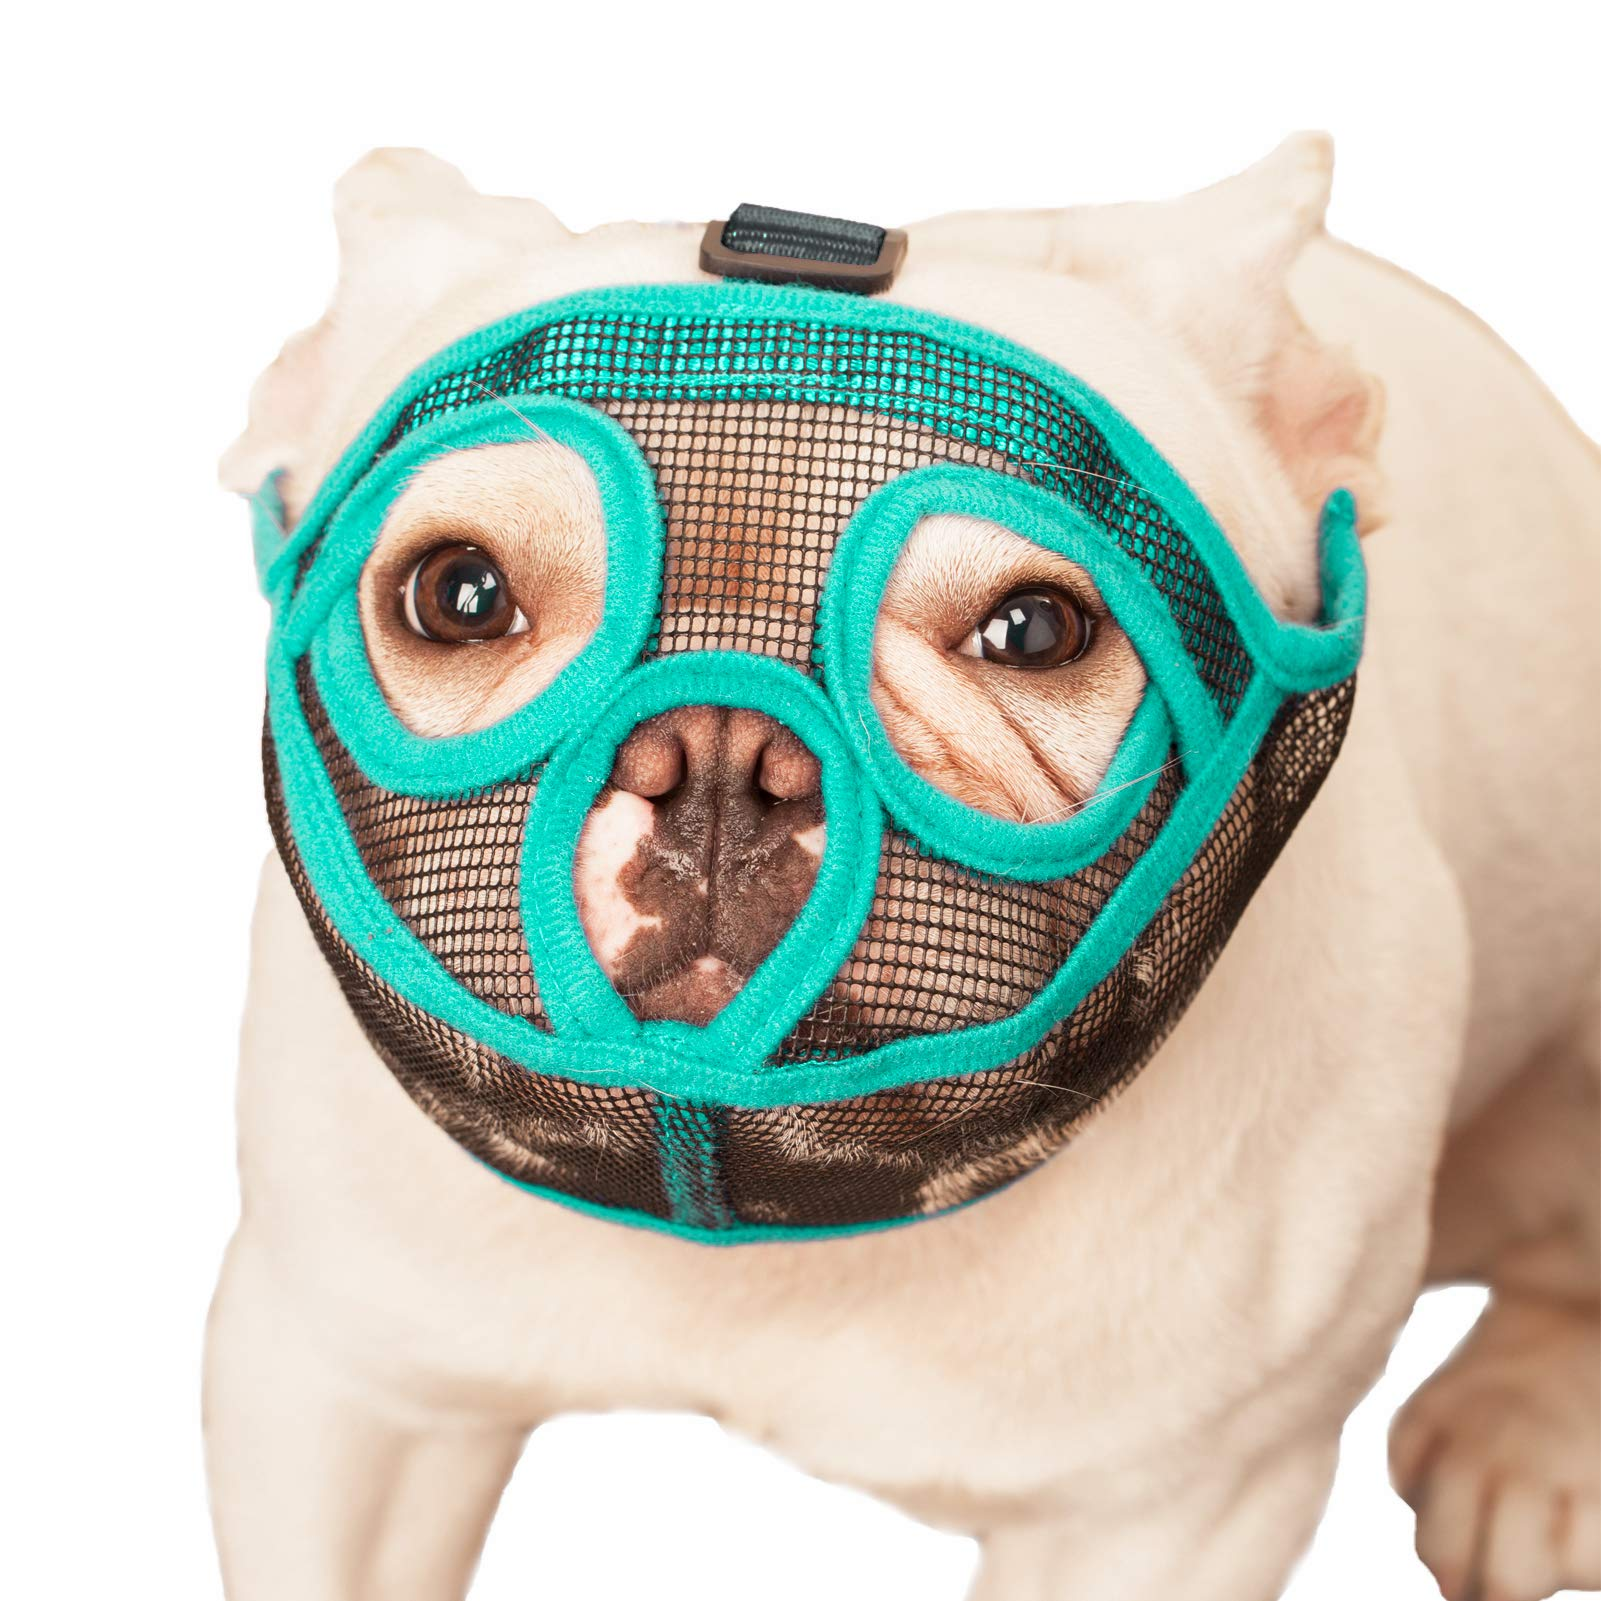 wintchuk Short Snout Dog Muzzle Mesh Mask Bulldog Muzzle Eye-Catching Lime Green Anti-Biting Chewing, Adjustable